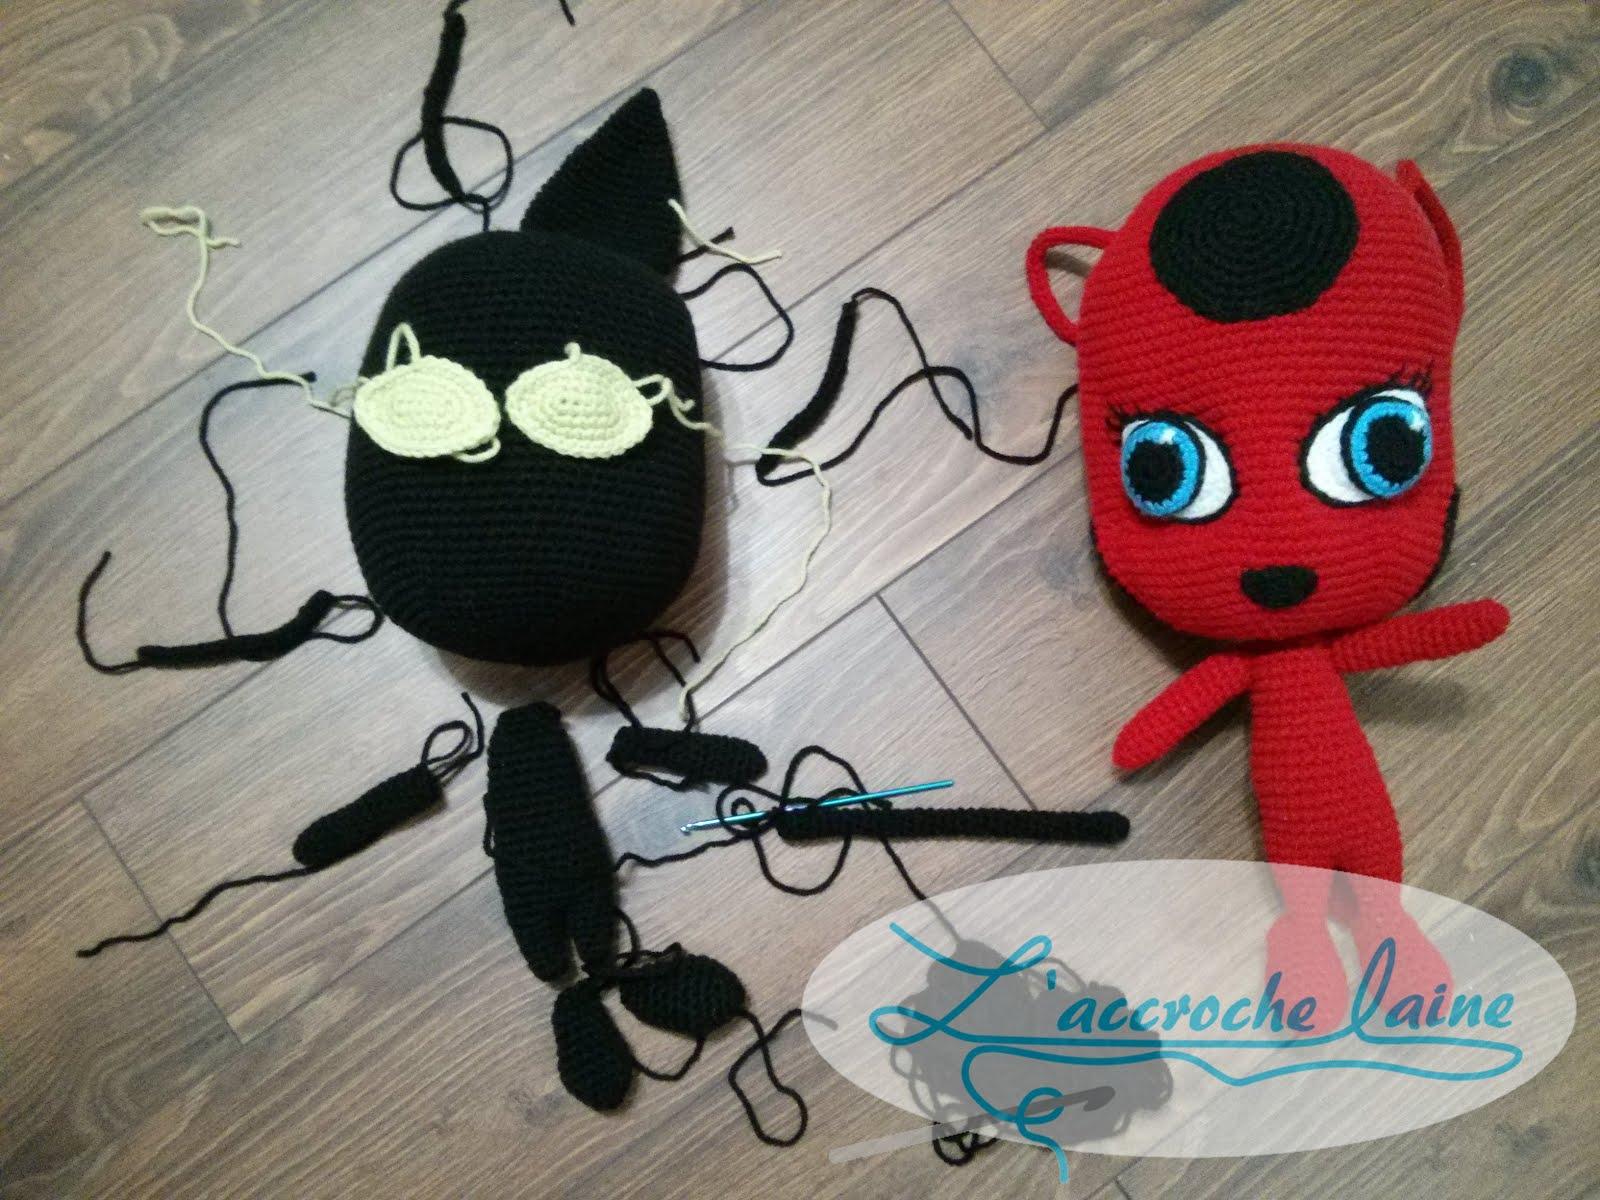 Miraculous Ladybug Crochet Doll Part 1 - YouTube | 1200x1600